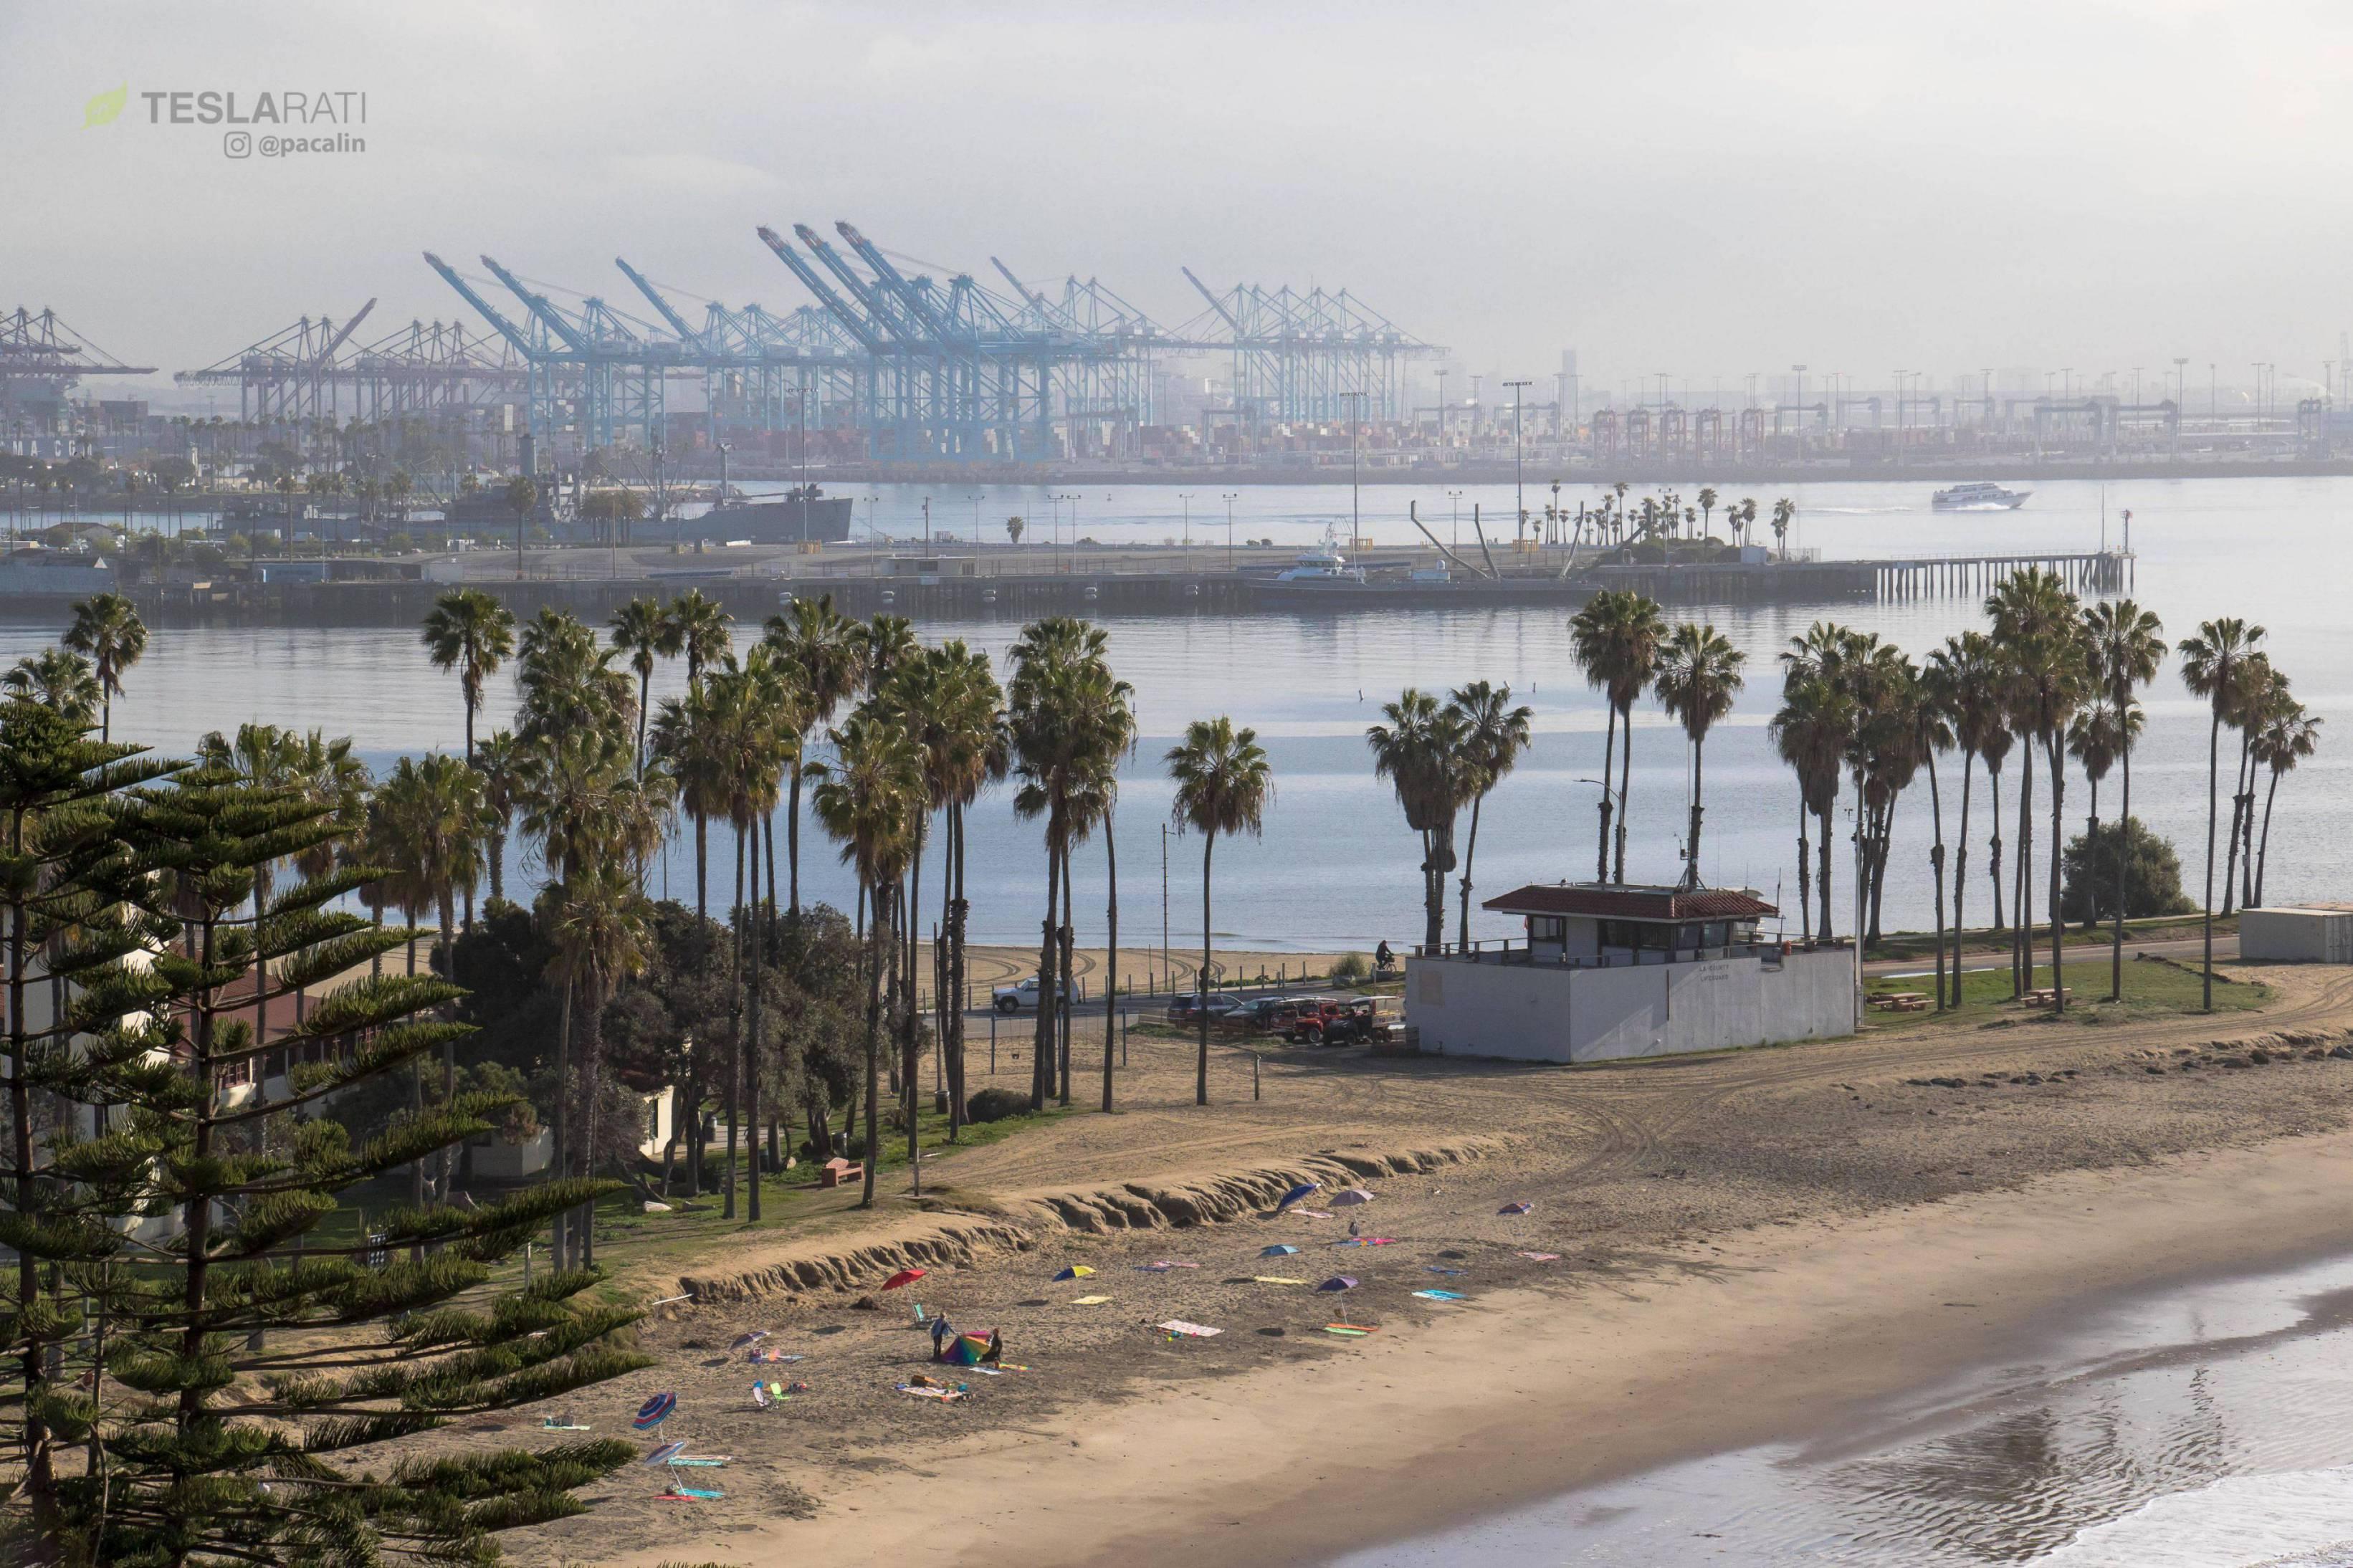 Mr Steven and Port of LA 2 032318 (Pauline Acalin)